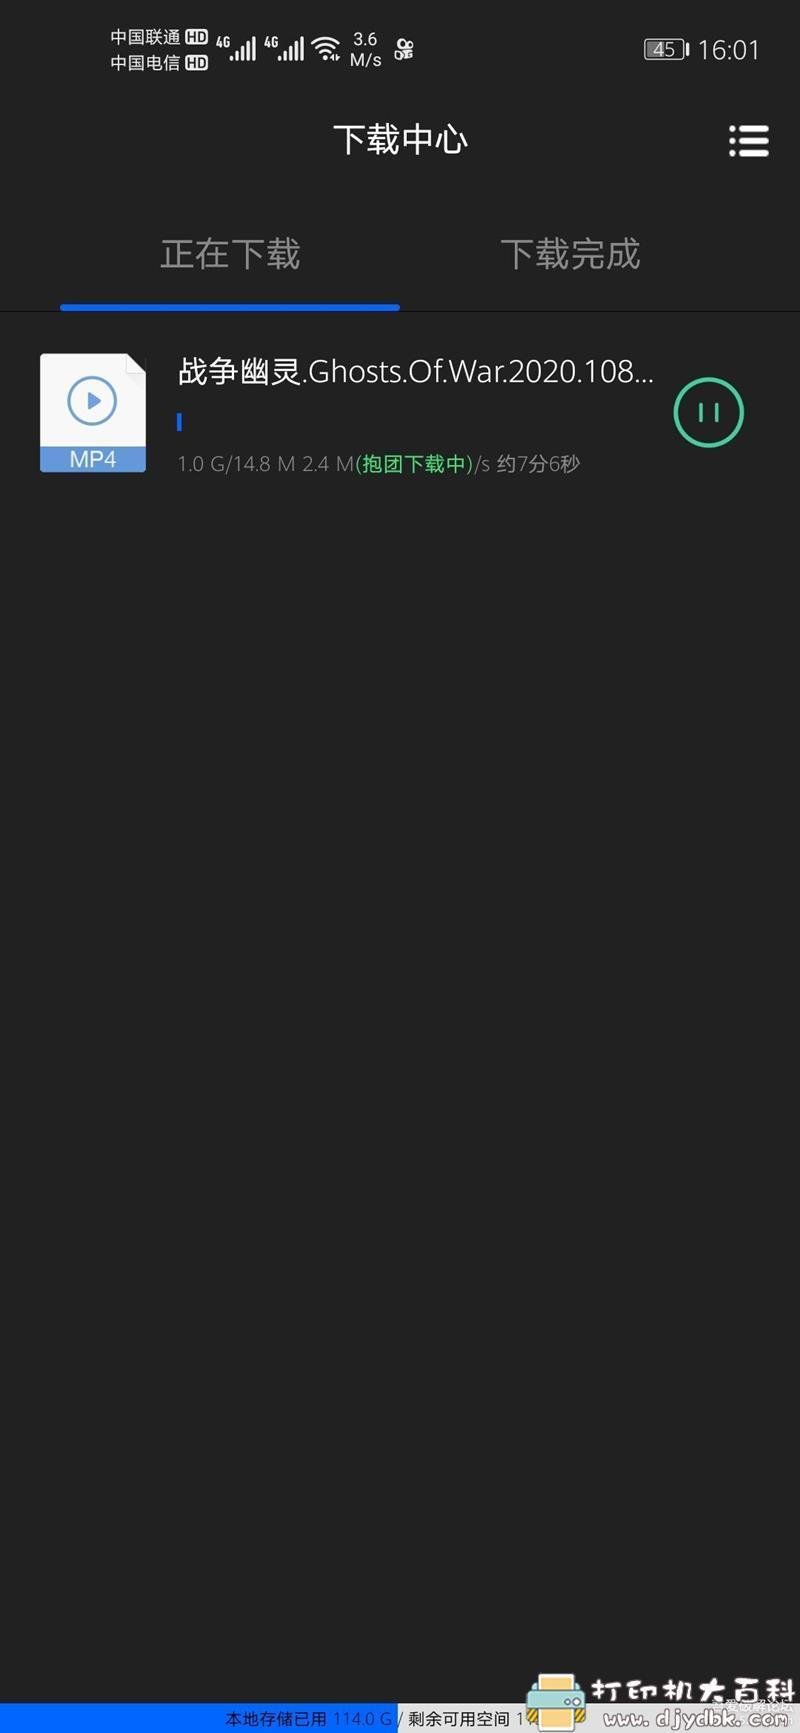 [Android]信鸽下载器v6.4,一款安卓下载工具,多线程下载模式 配图 No.2